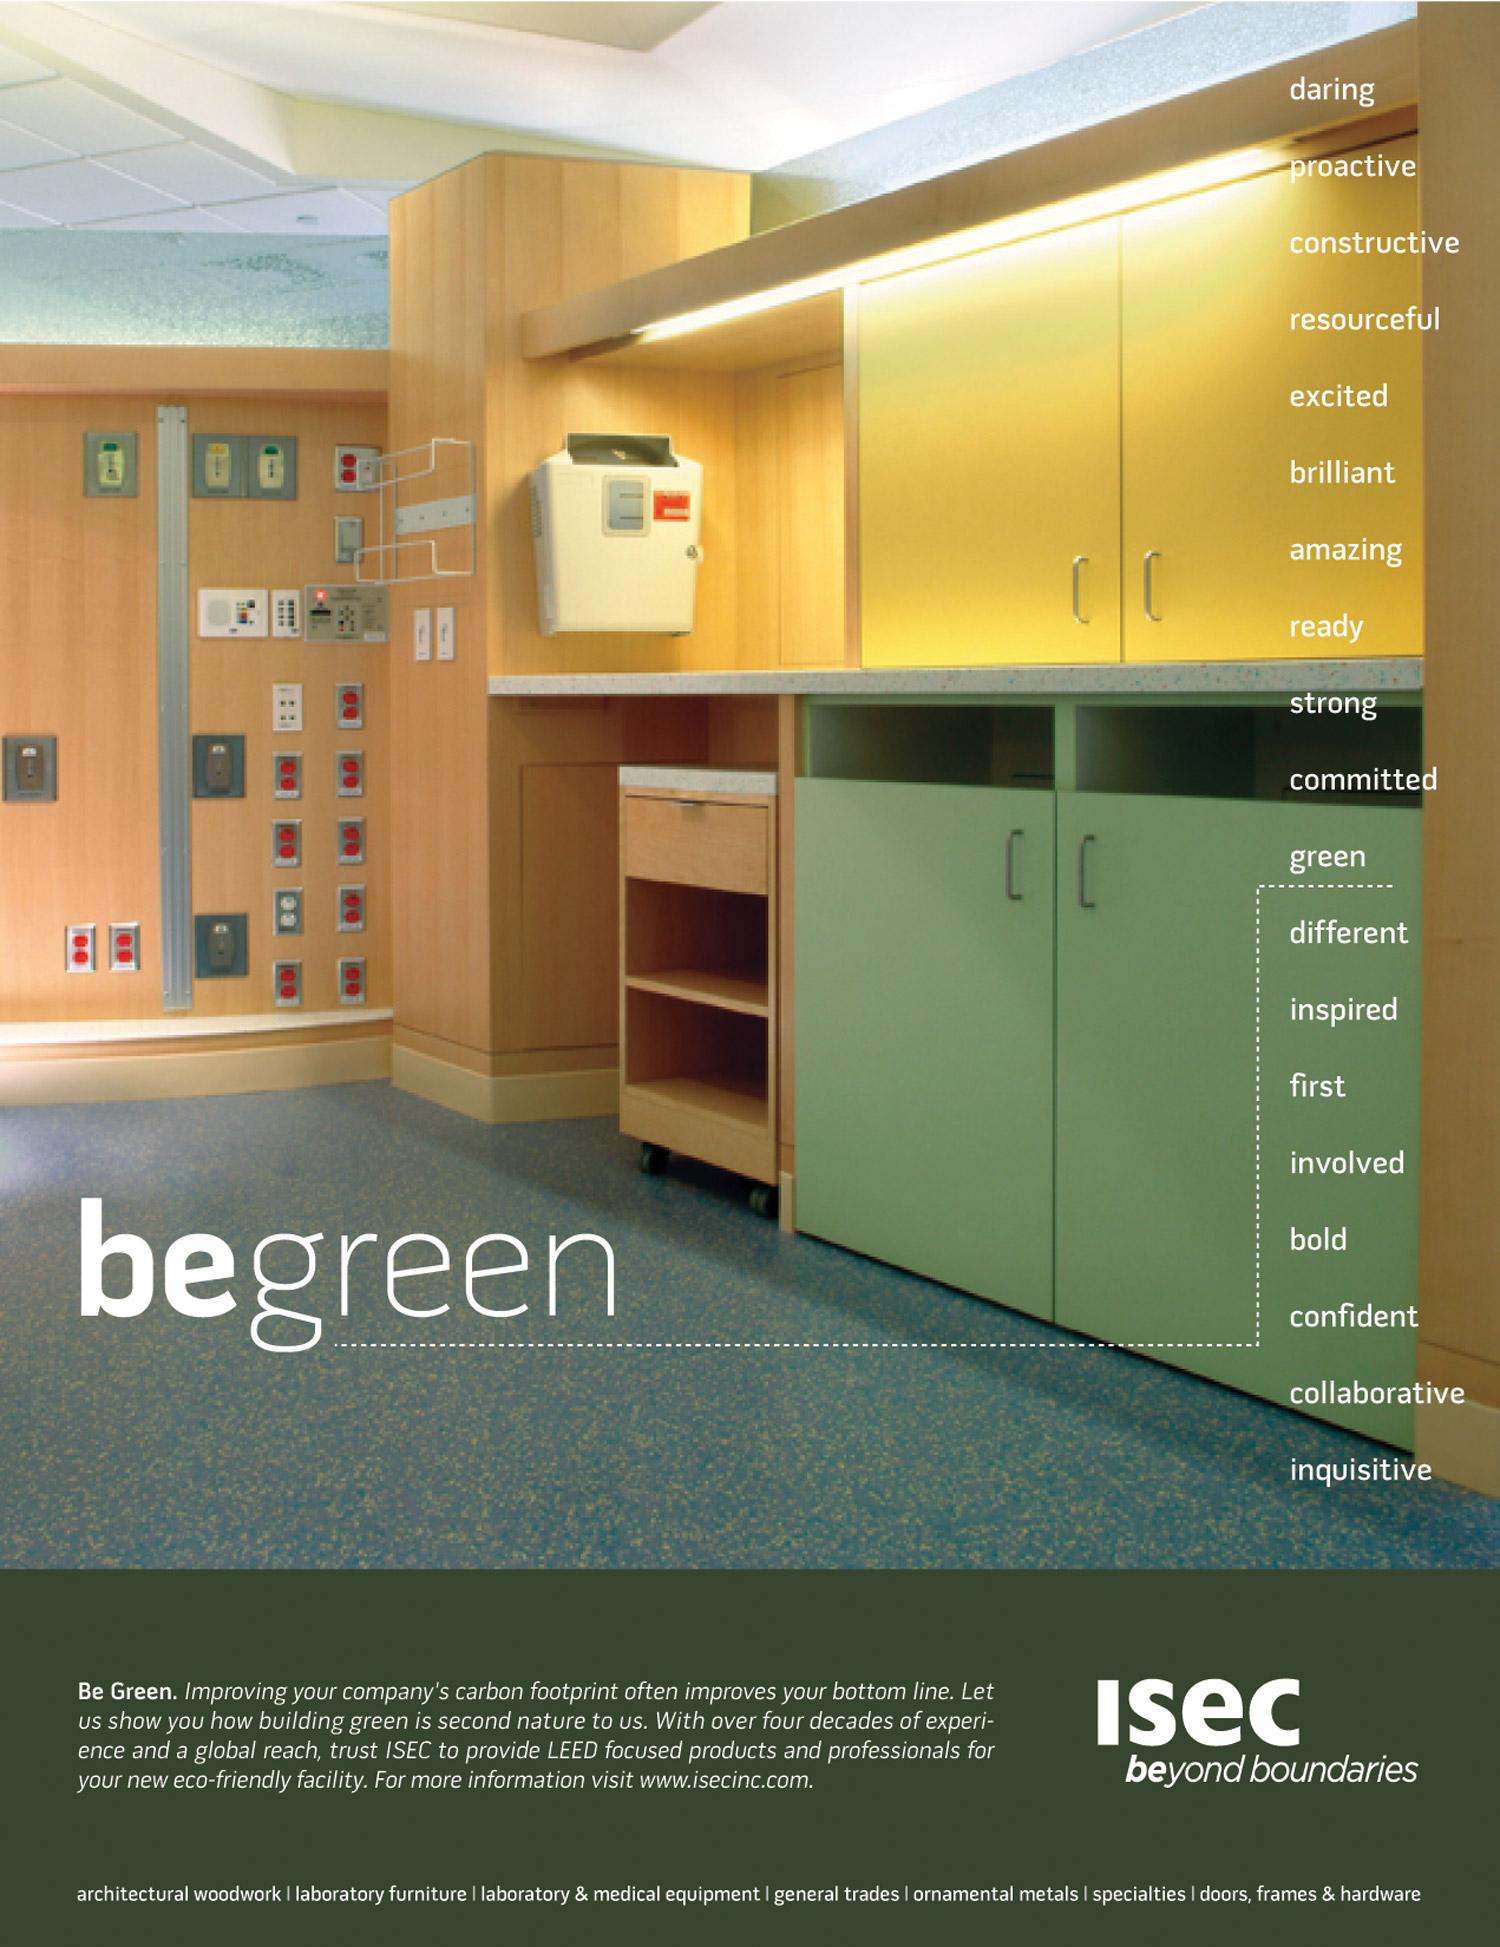 isec_be_green.jpg